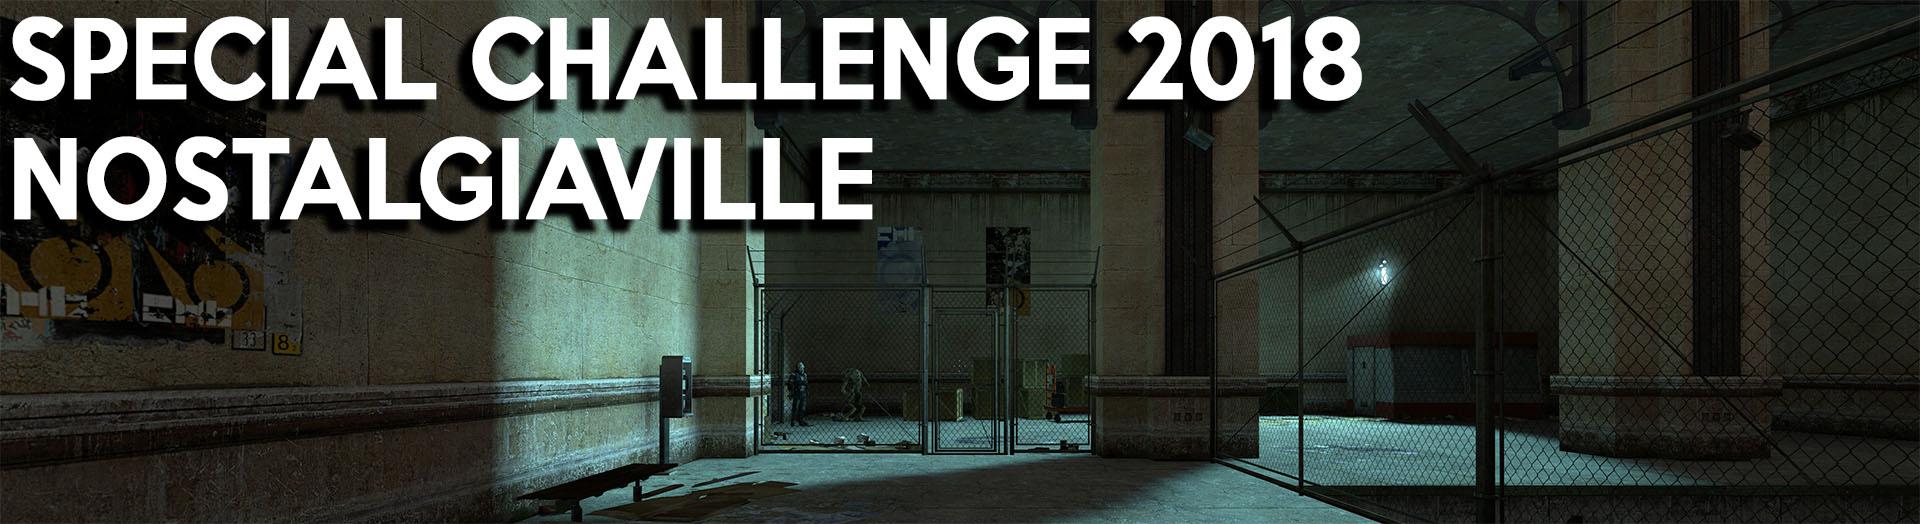 Special Challenge: NostalgiaVille